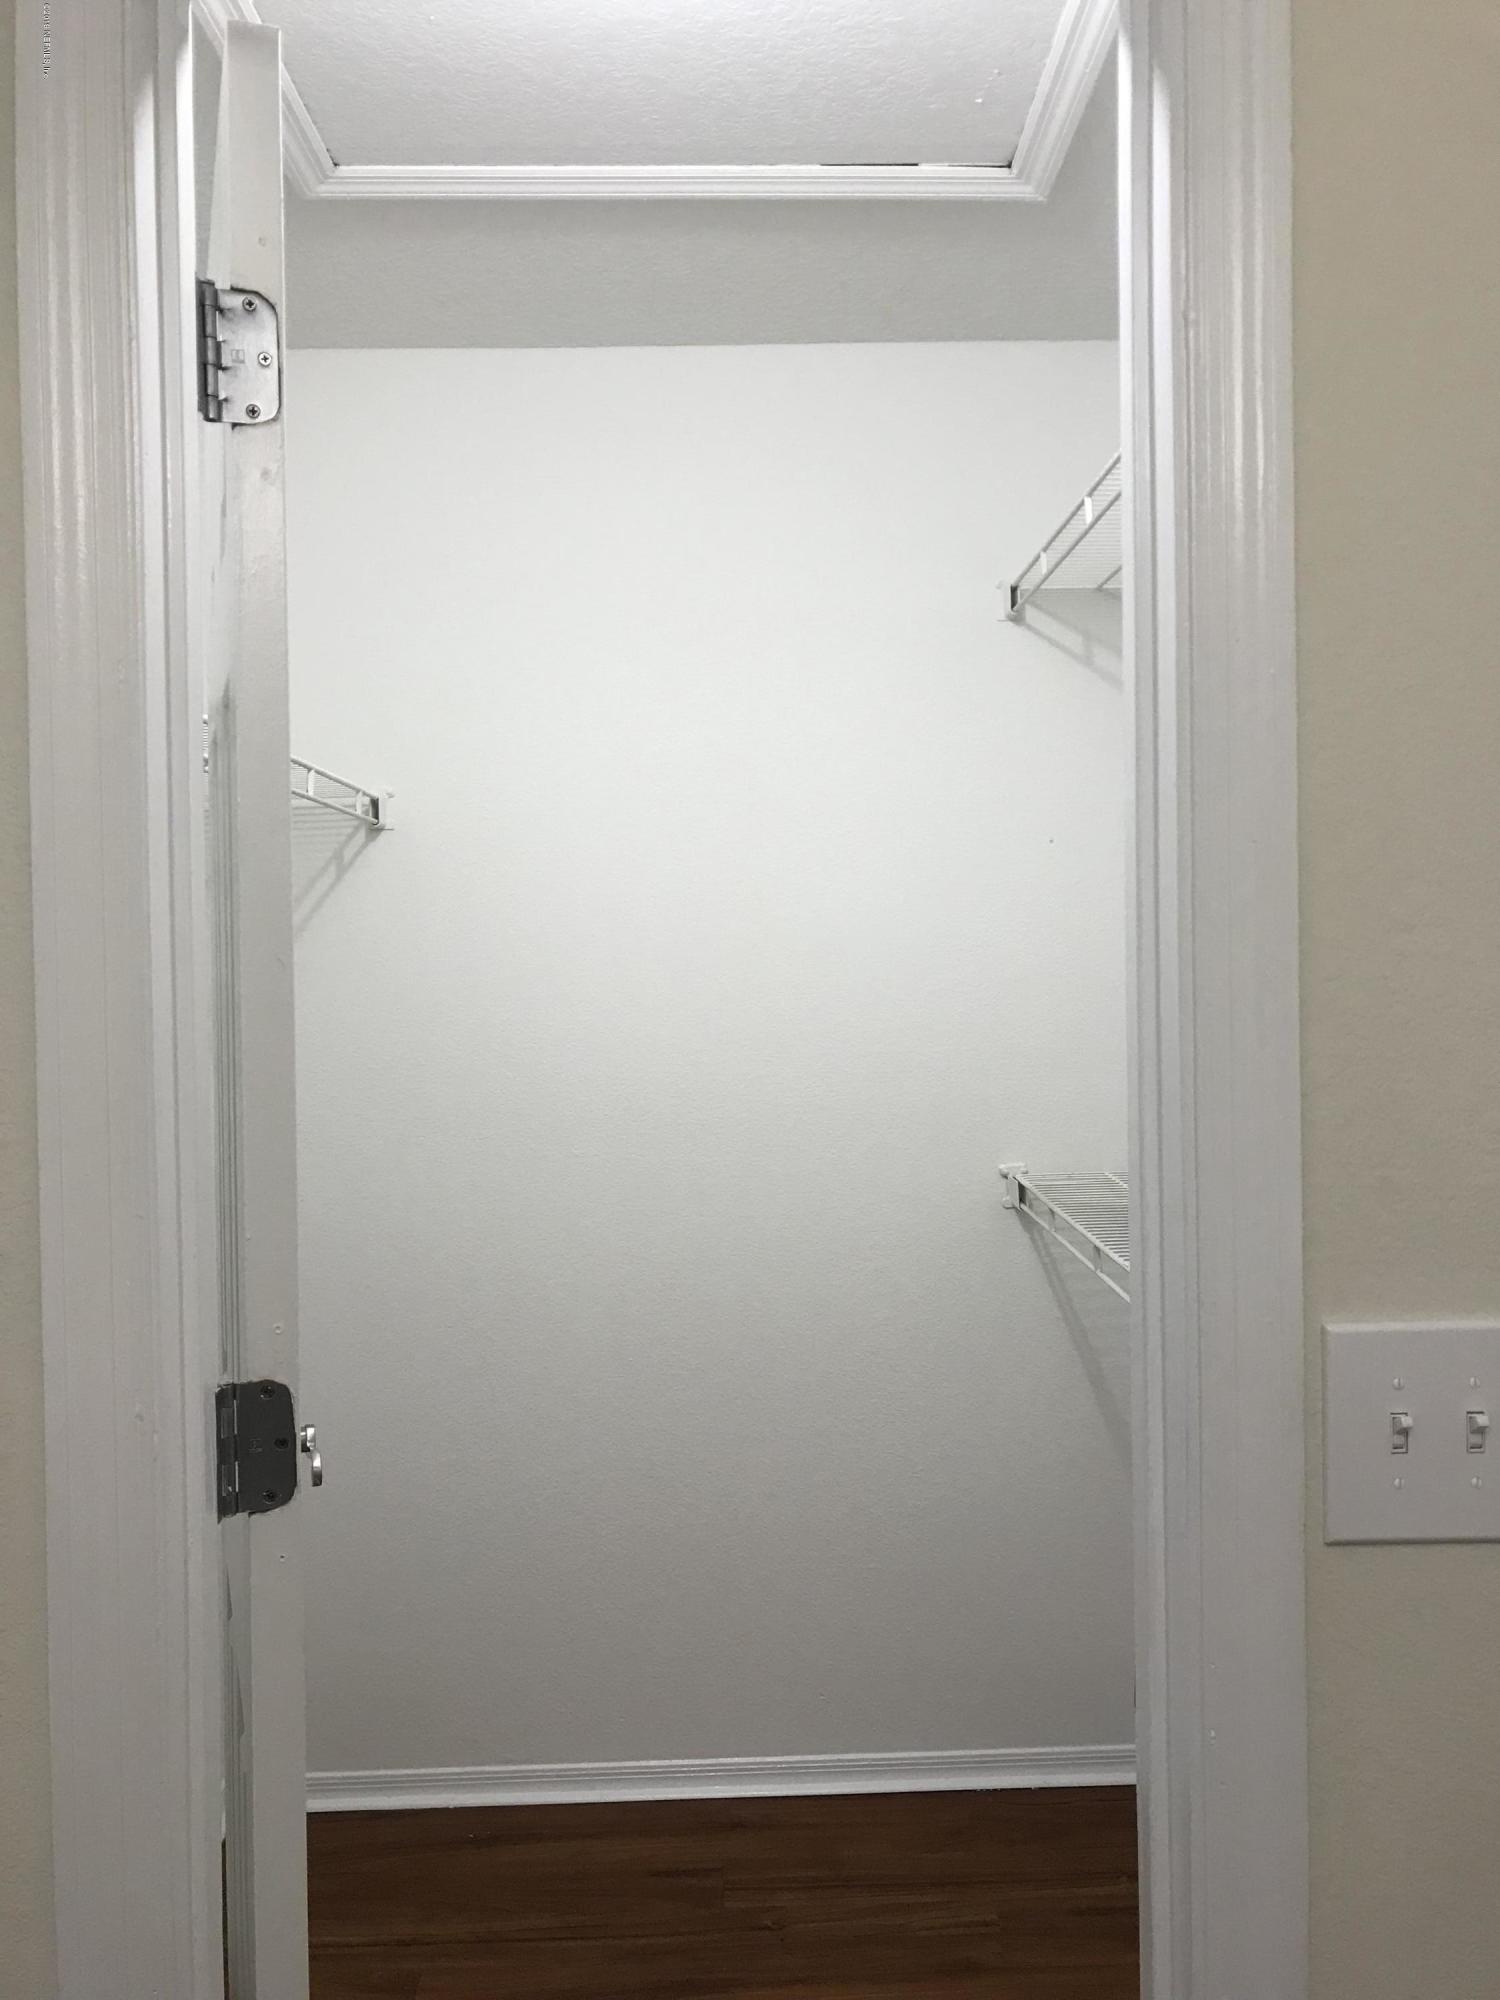 3 ARBOR CLUB- PONTE VEDRA BEACH- FLORIDA 32082, 2 Bedrooms Bedrooms, ,2 BathroomsBathrooms,Condo,For sale,ARBOR CLUB,984065